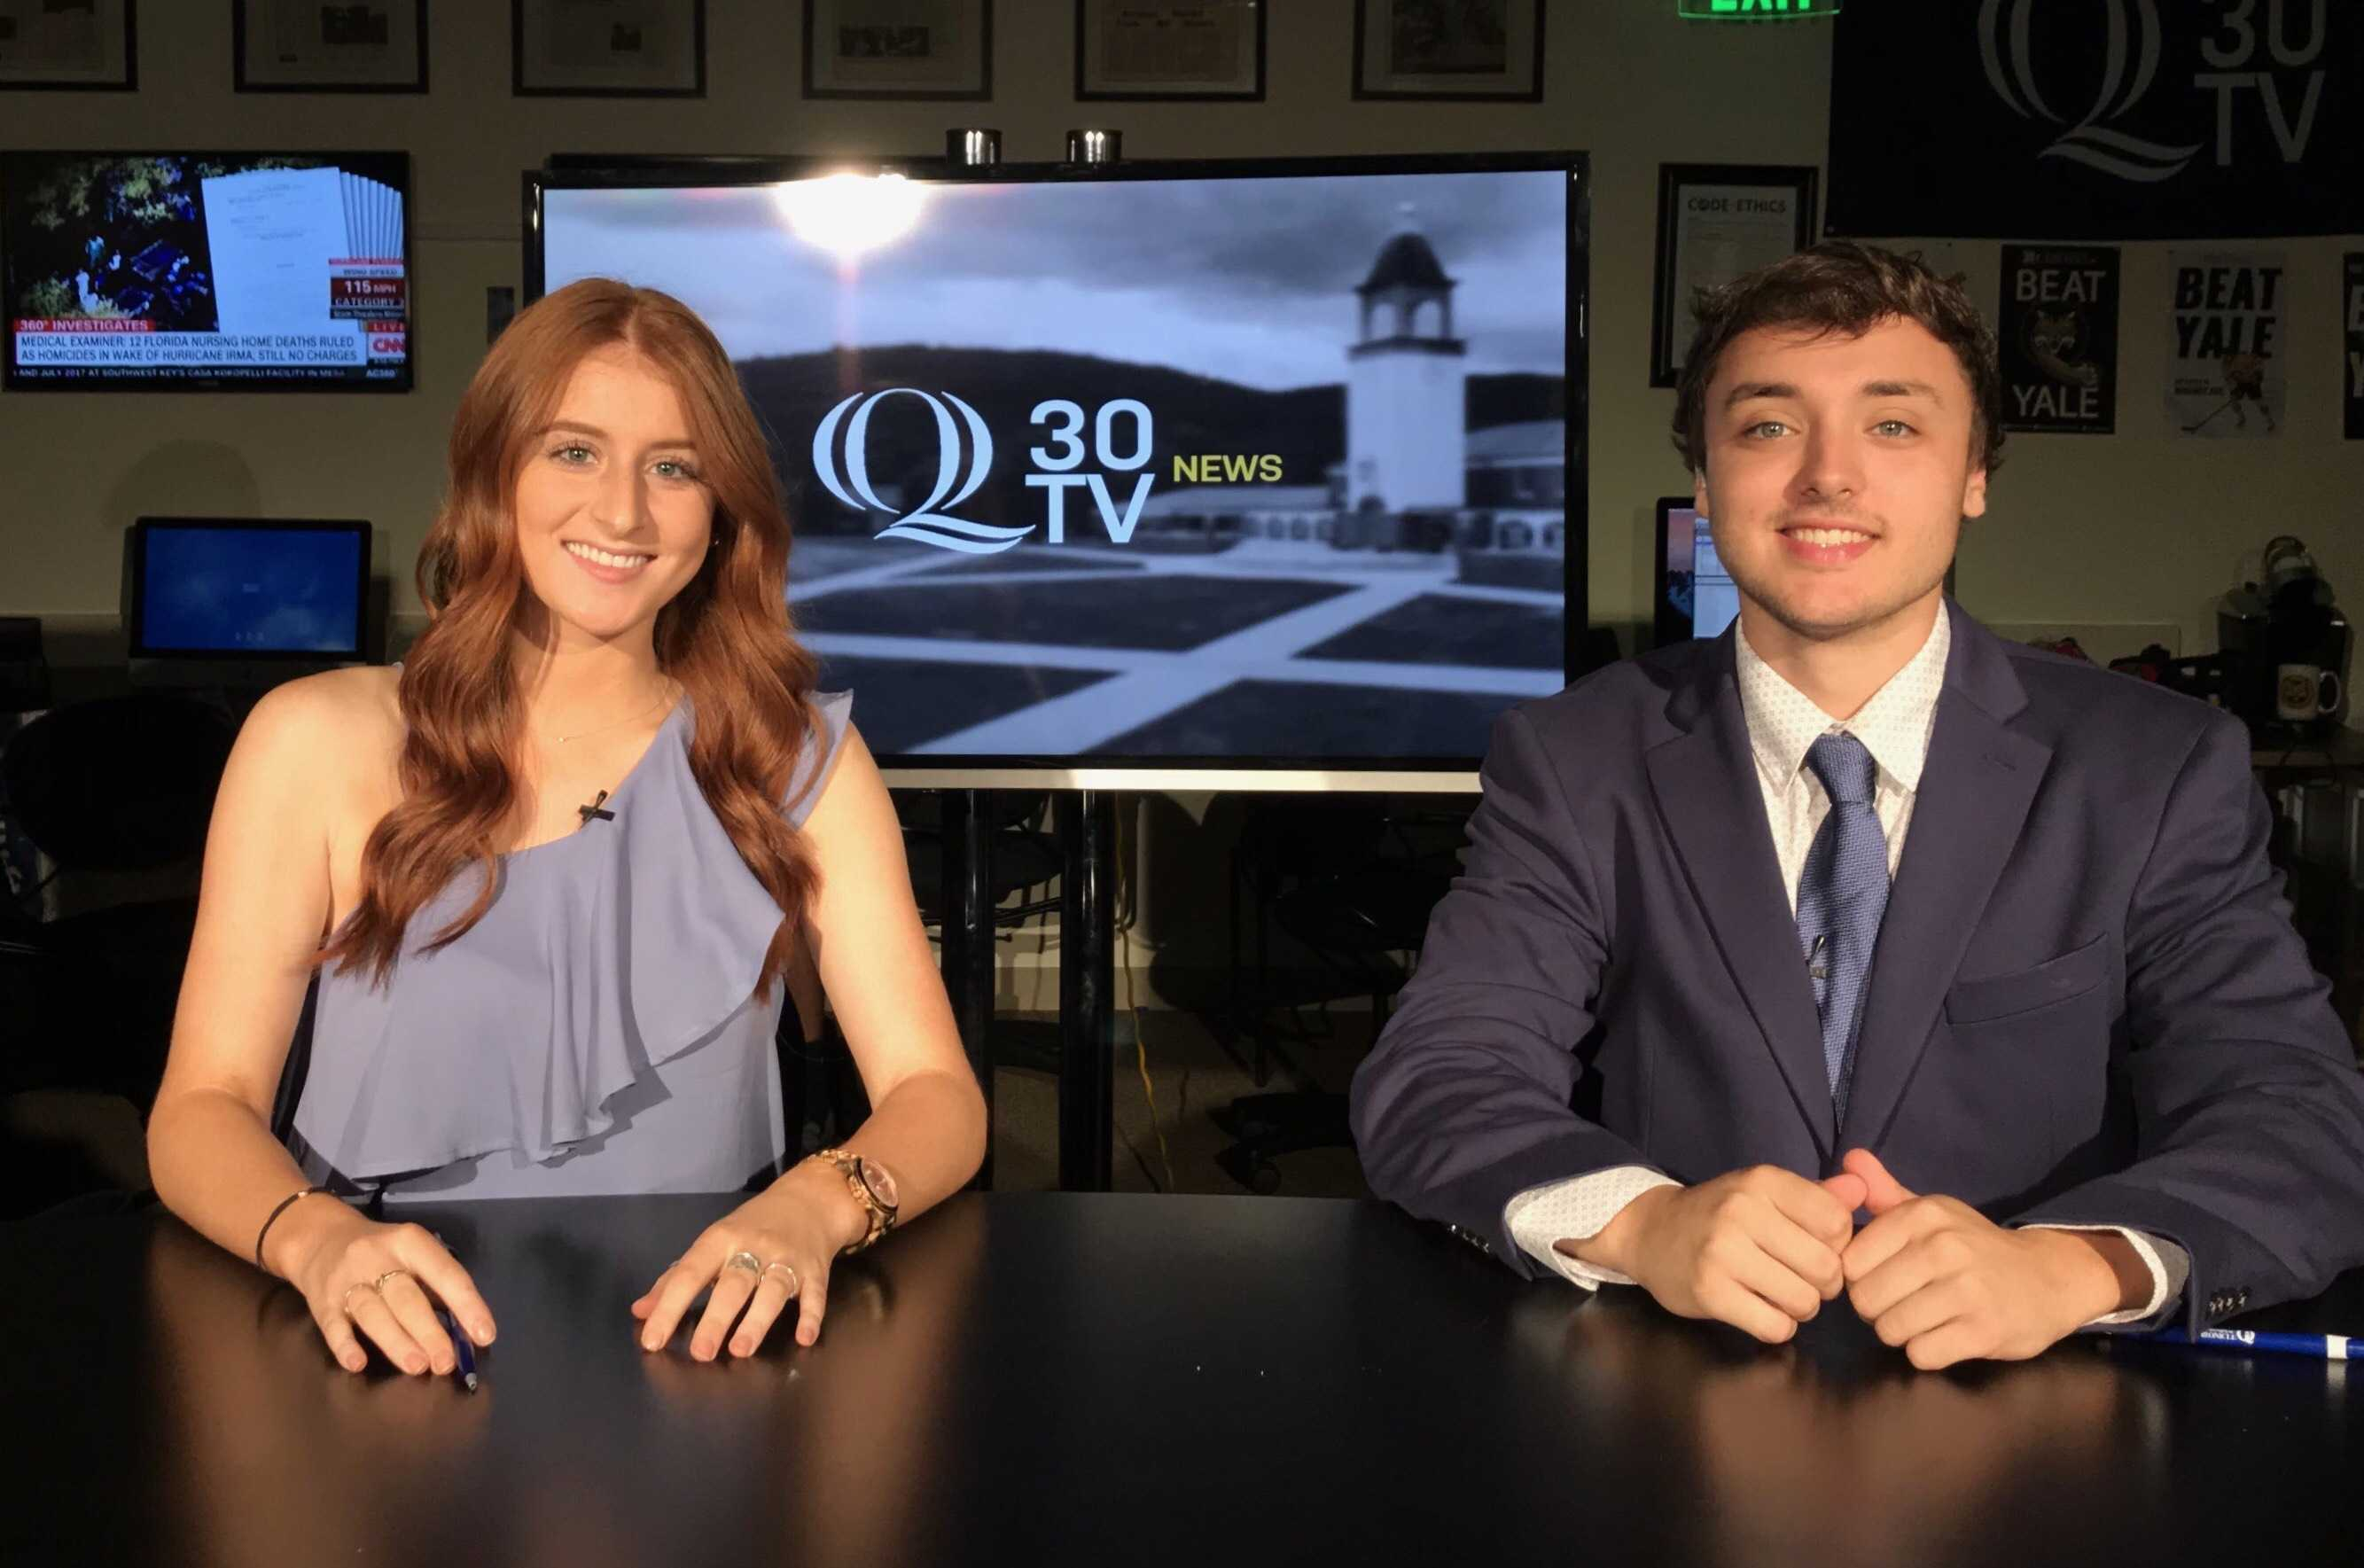 Q30 Newscast: 9/12/18